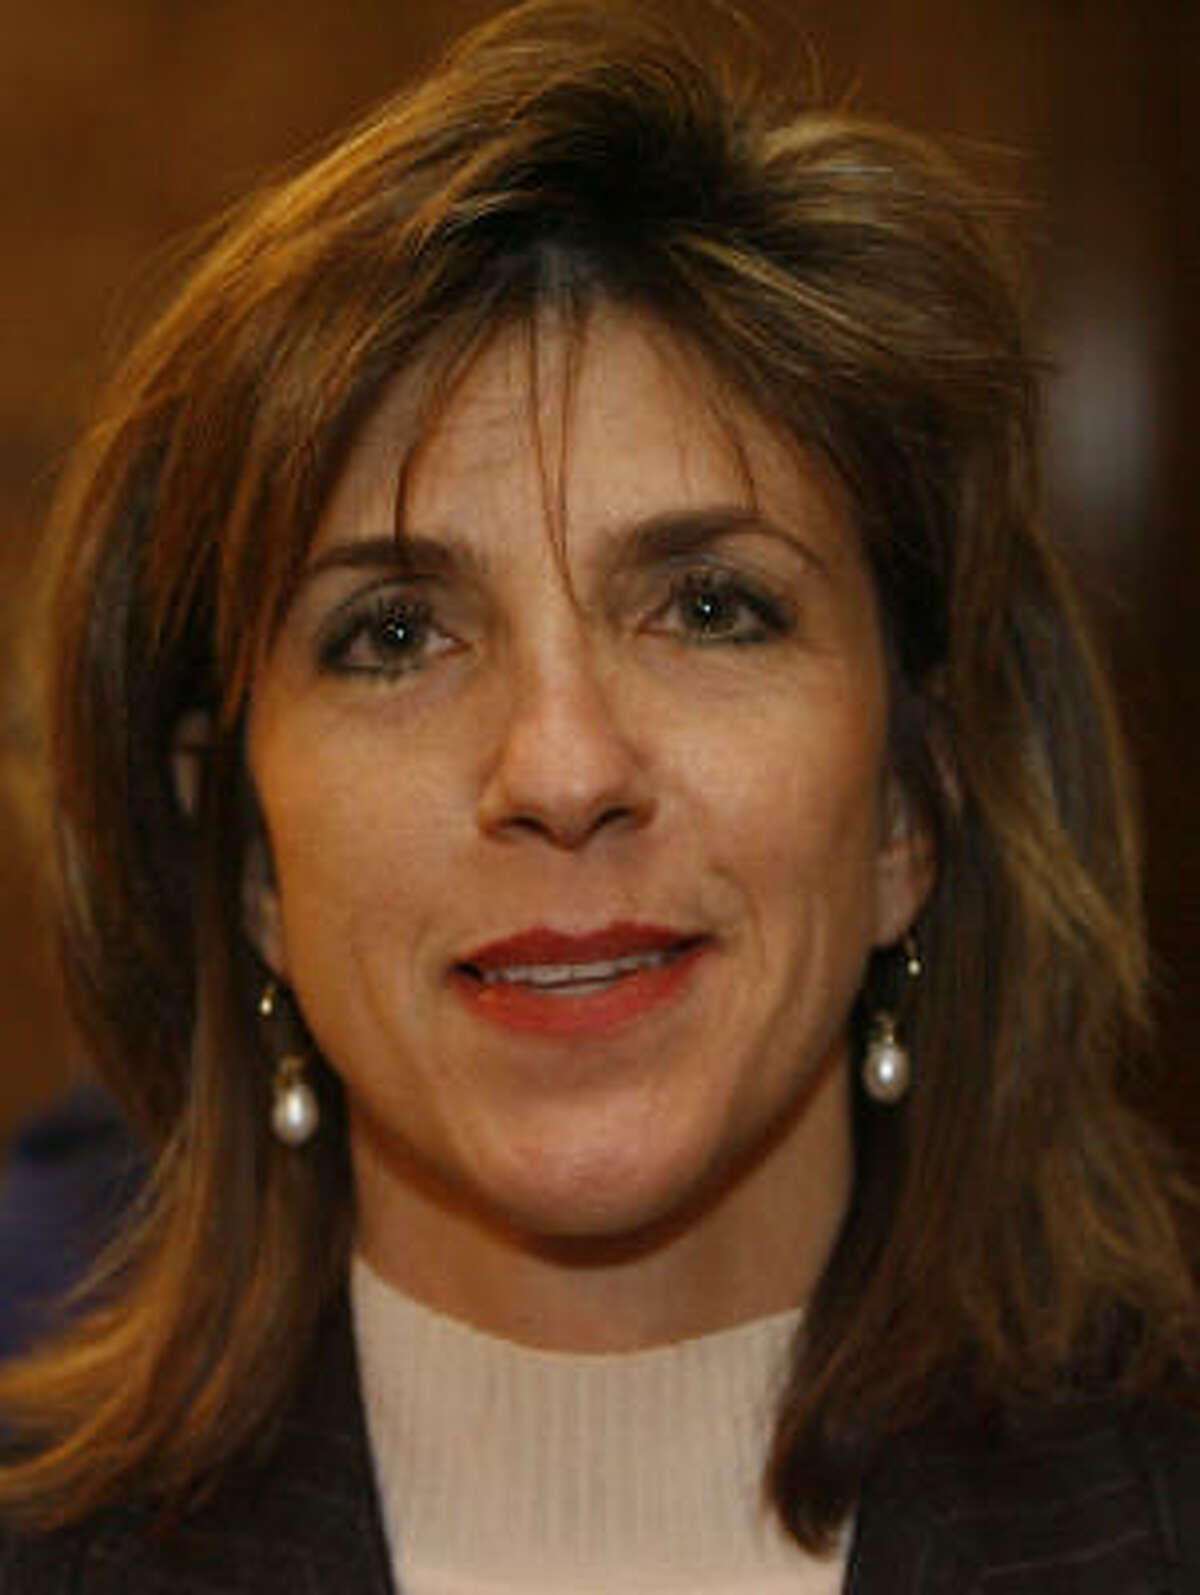 Republican district attorney candidate Kelly Siegler.